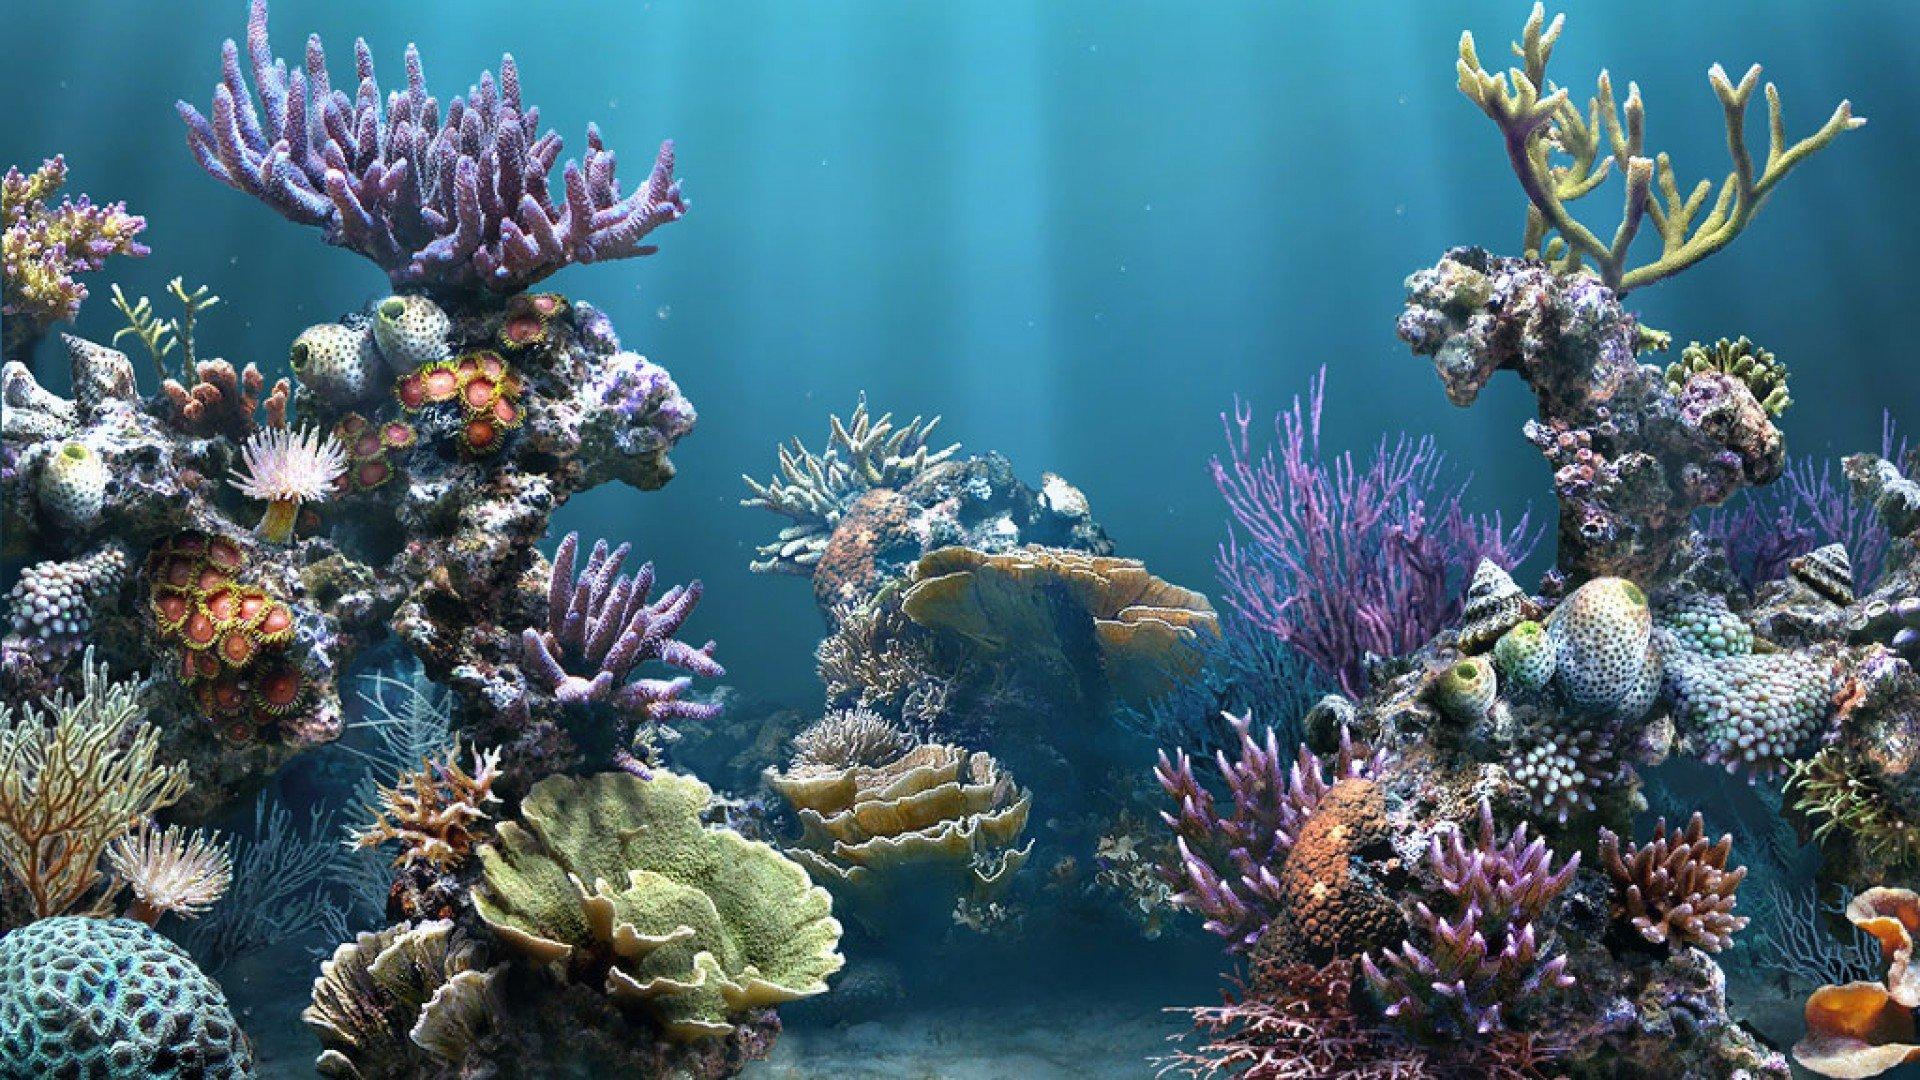 47] Aquarium HD 1080p Wallpaper on WallpaperSafari 1920x1080